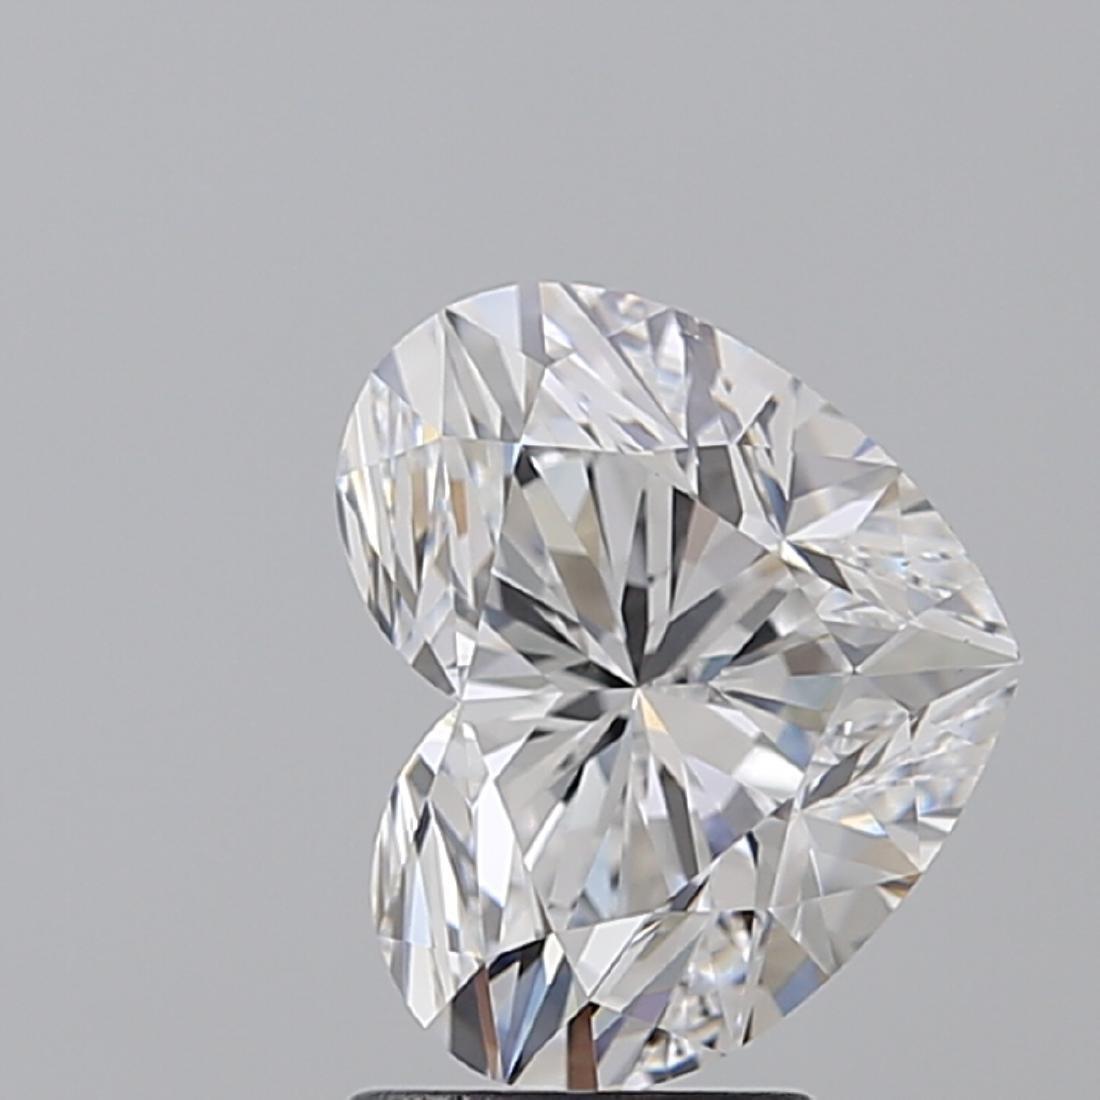 3.01 ct, Color D/VS2, Heart cut Diamond - 2